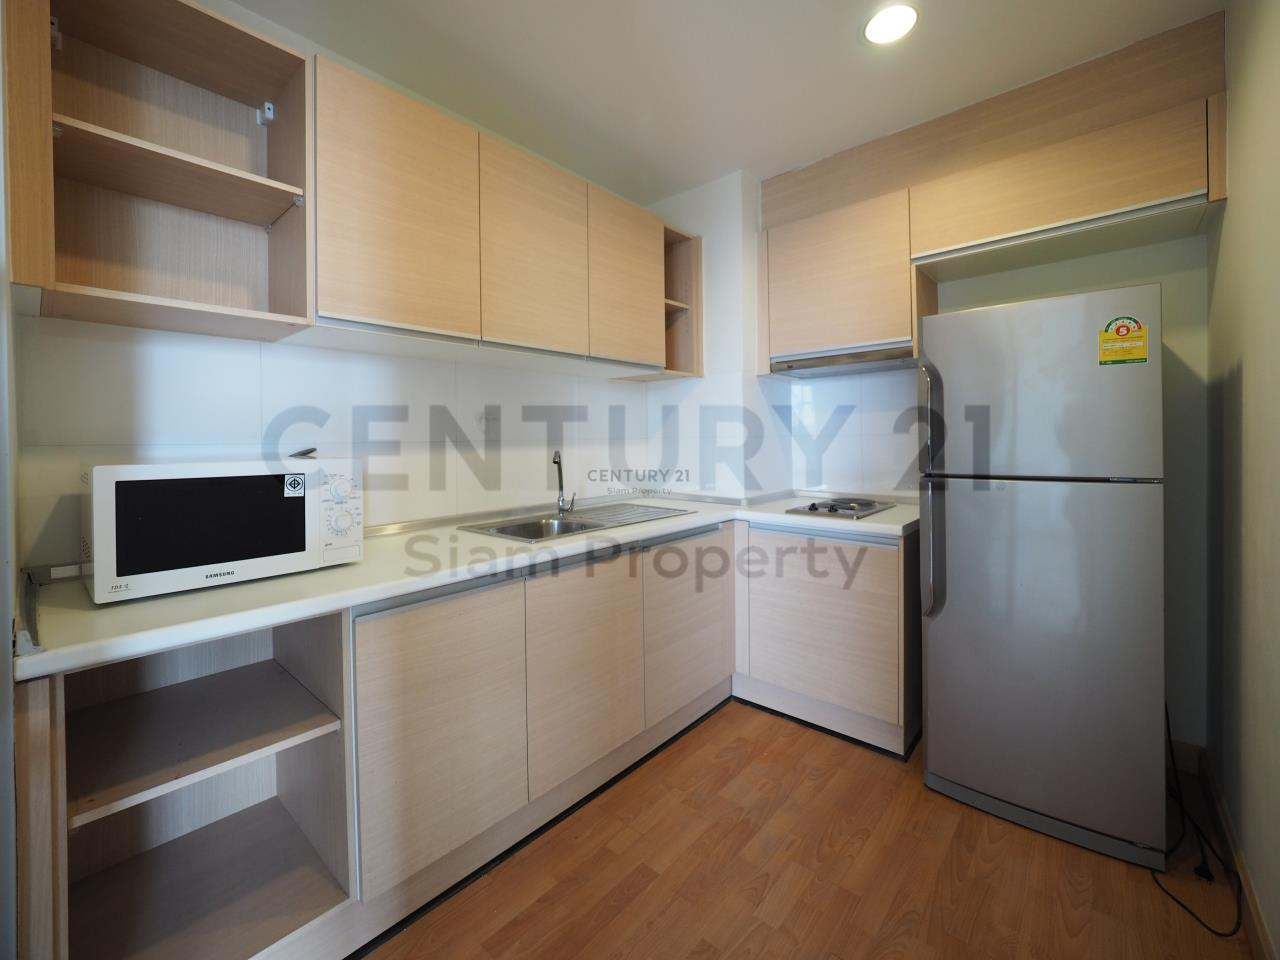 Century21 Siam Property Agency's Rhythm Ratchada 2